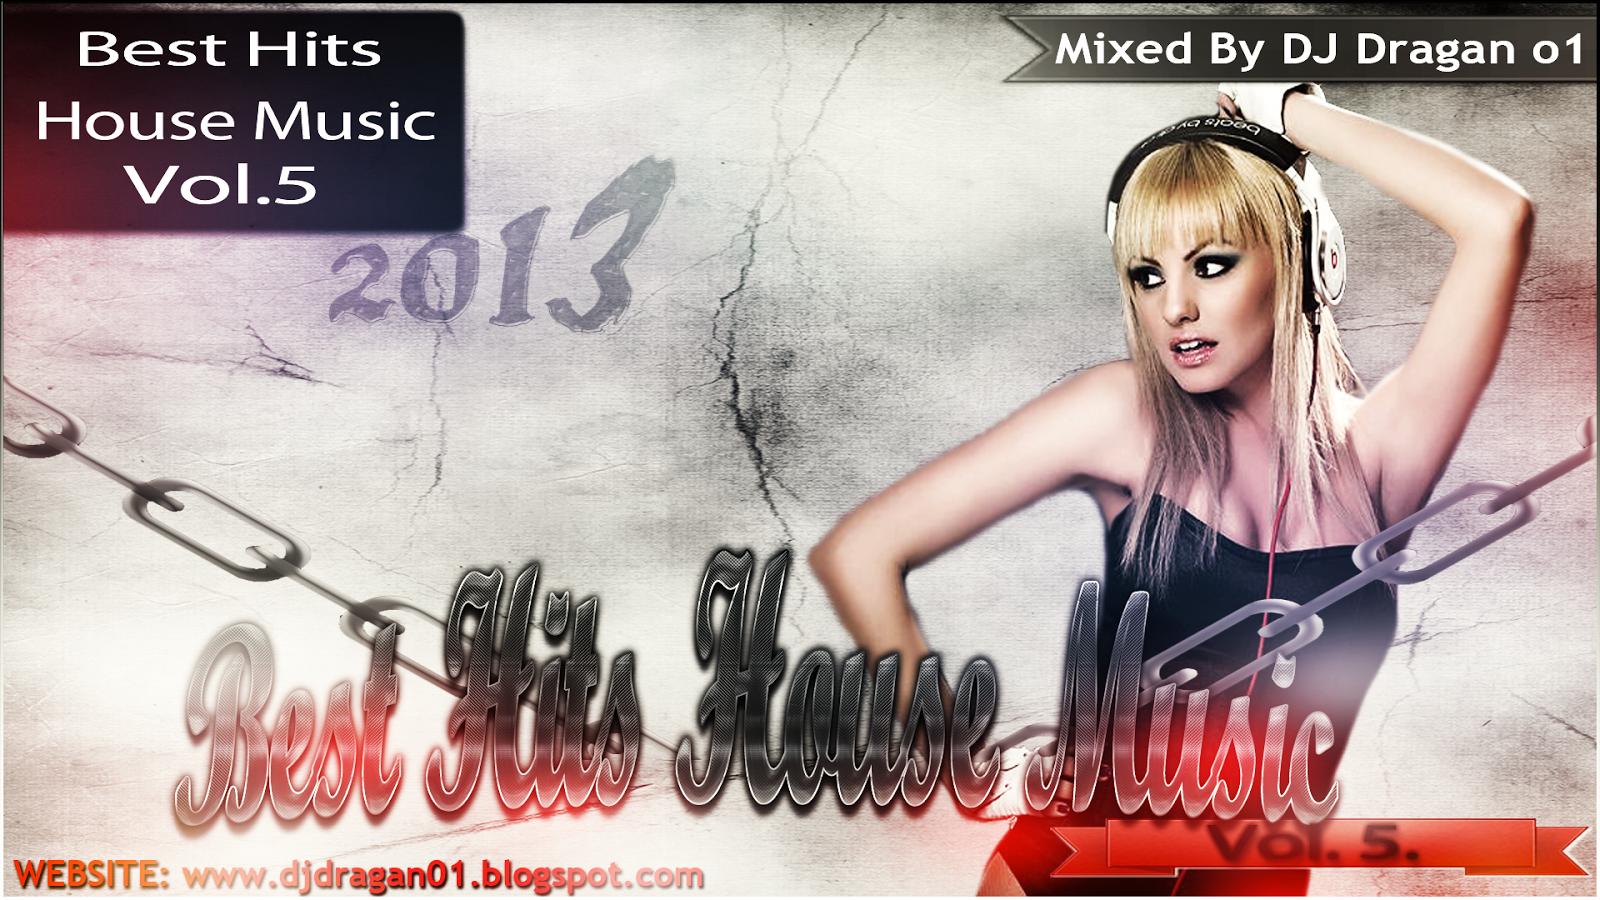 Dj dragan o1 dj dragan o1 best hits house music vol 5 2013 for House music greatest hits